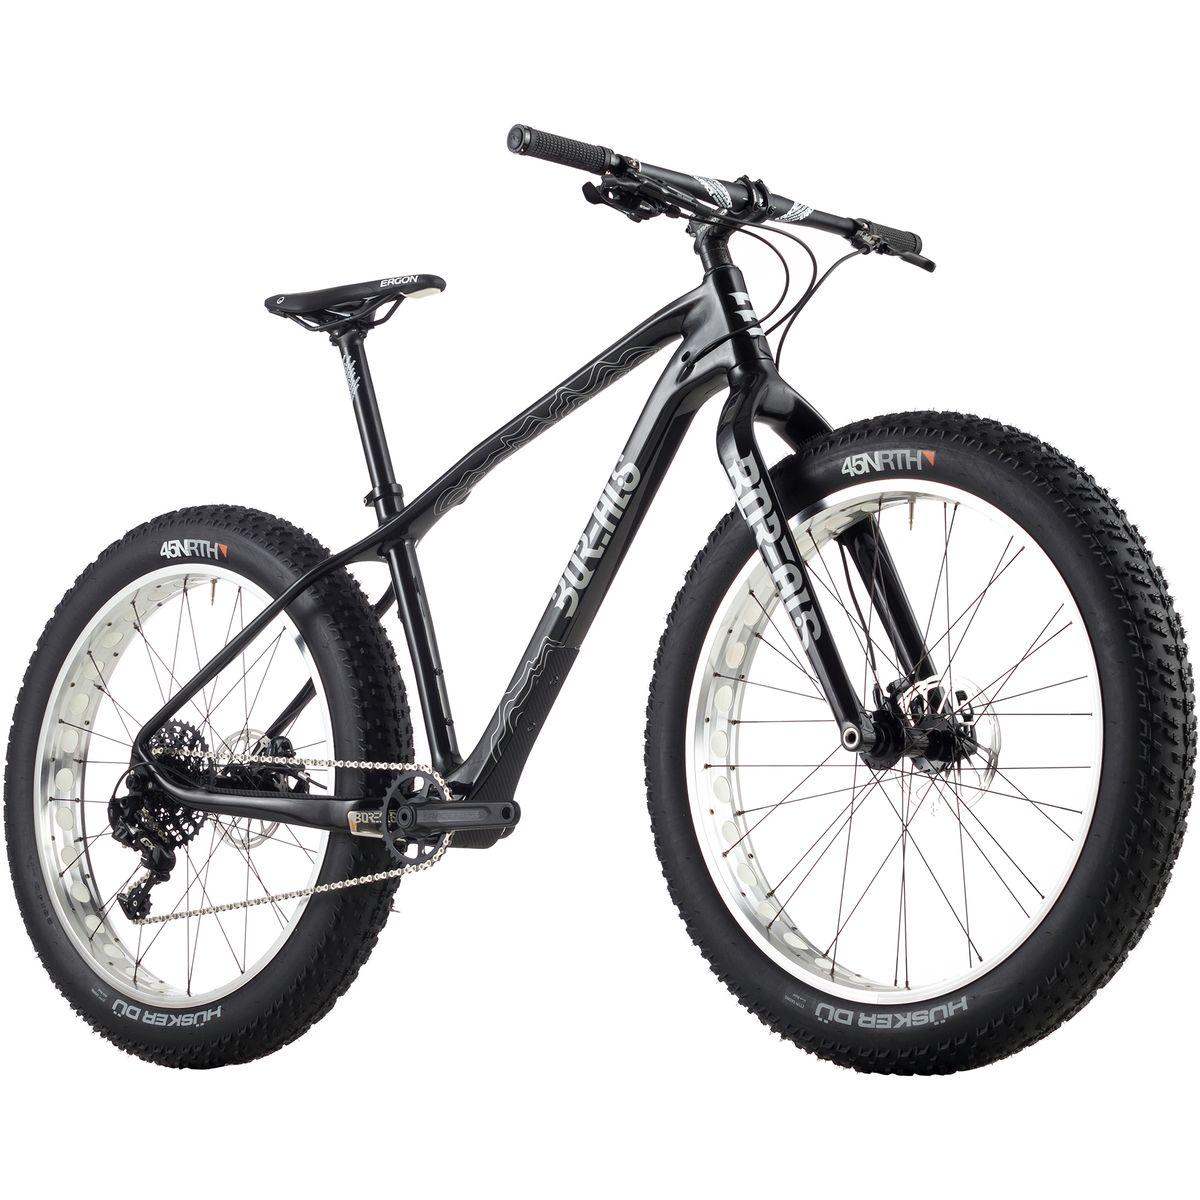 Borealis Bikes Echo Gx Complete Fat Bike 2016 Competitive Cyclist